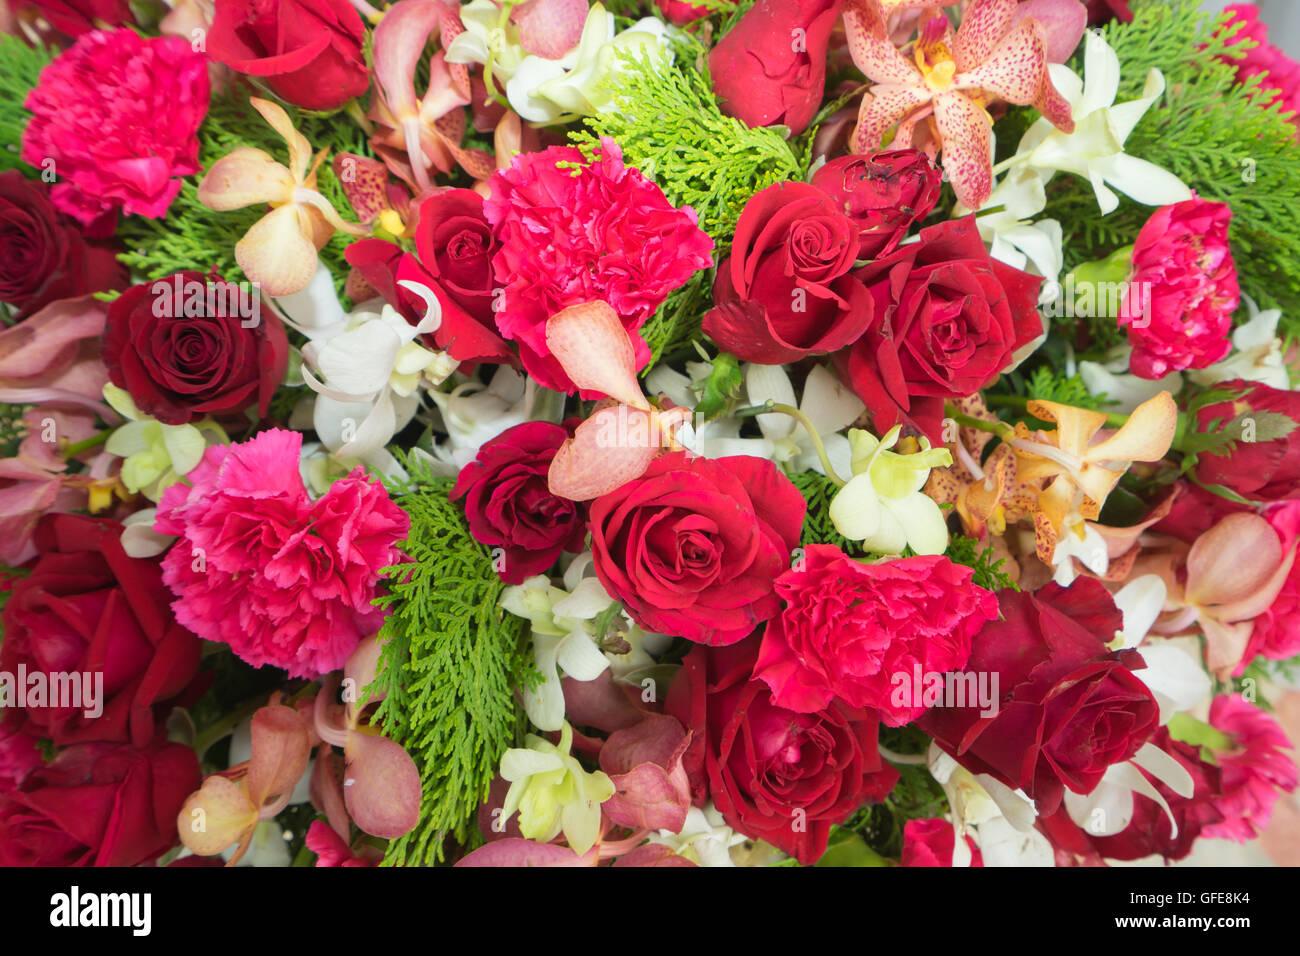 Colorful flowers fake art background Stock Photo: 112796184 - Alamy